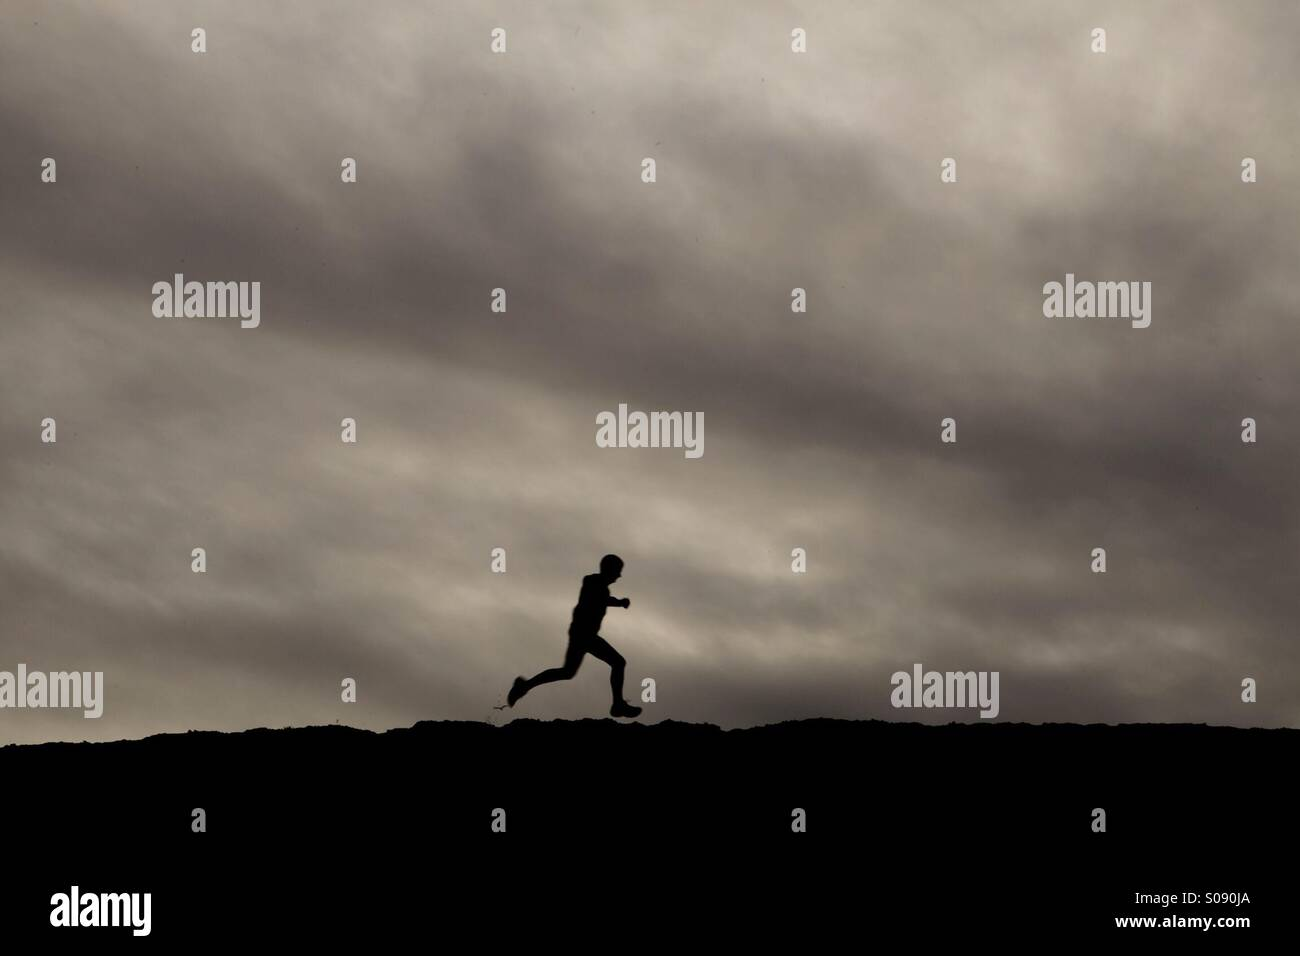 Running man 2 - Stock Image